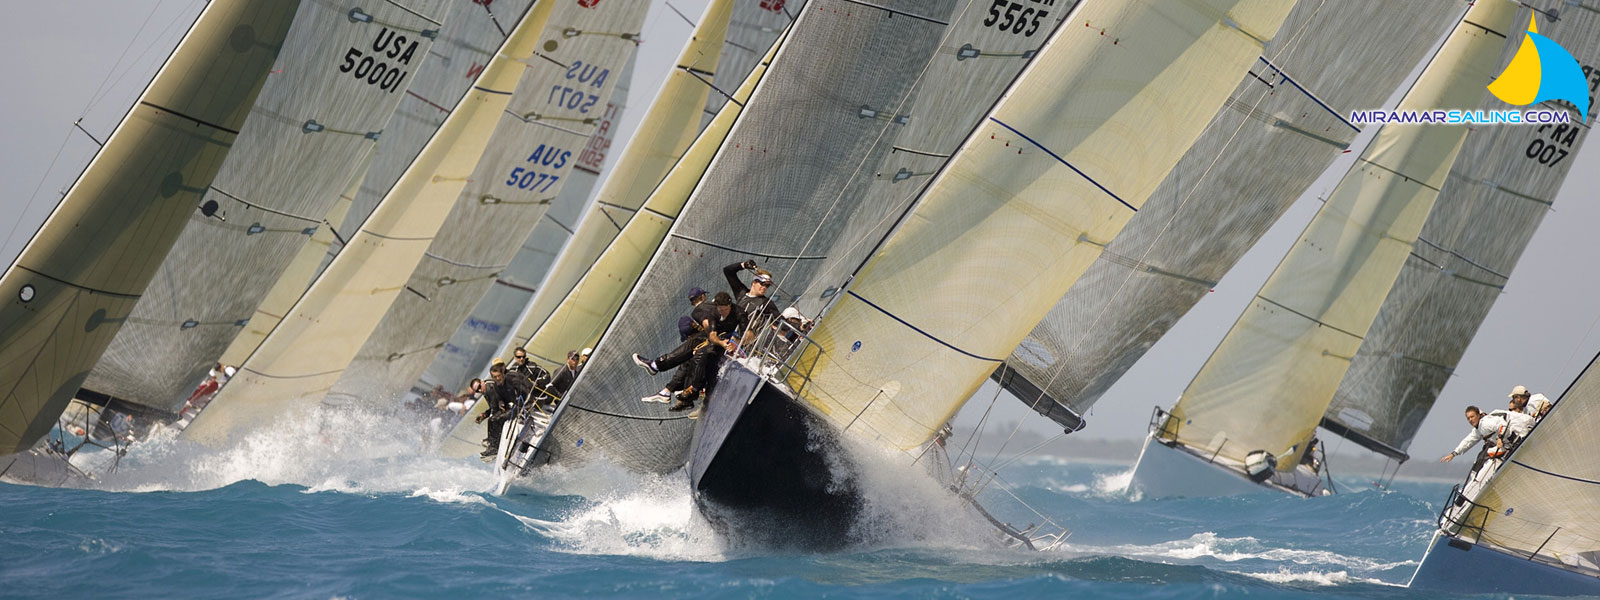 Yacht race charter